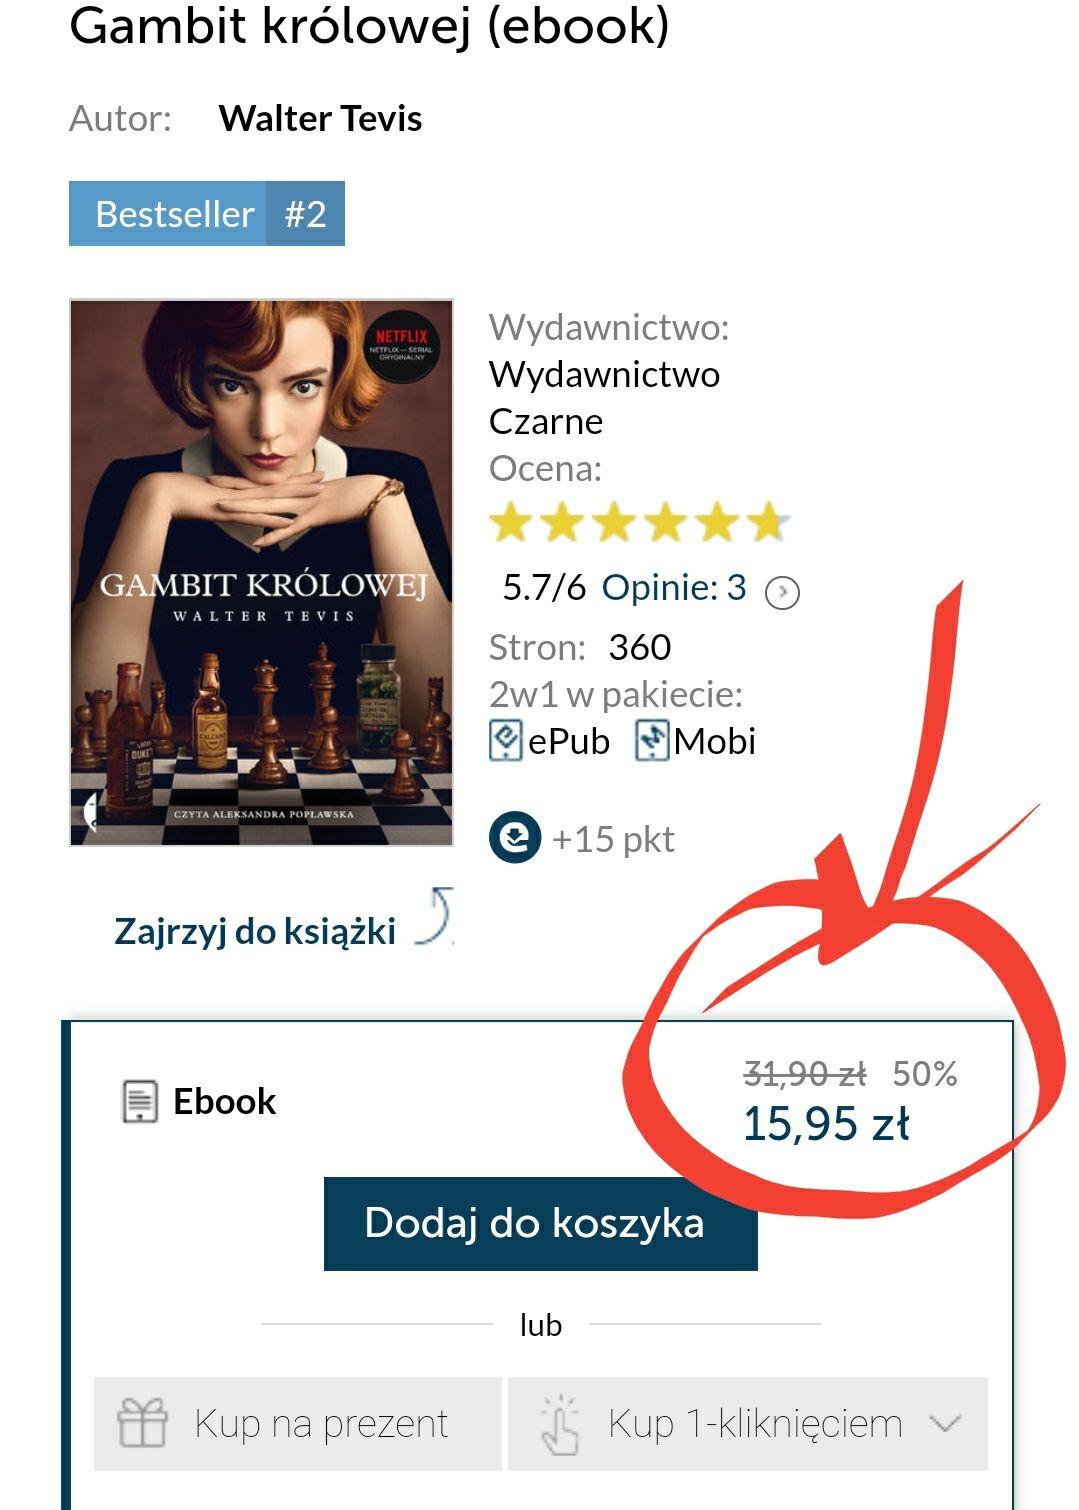 Gambit królowej (ebook) - 50%